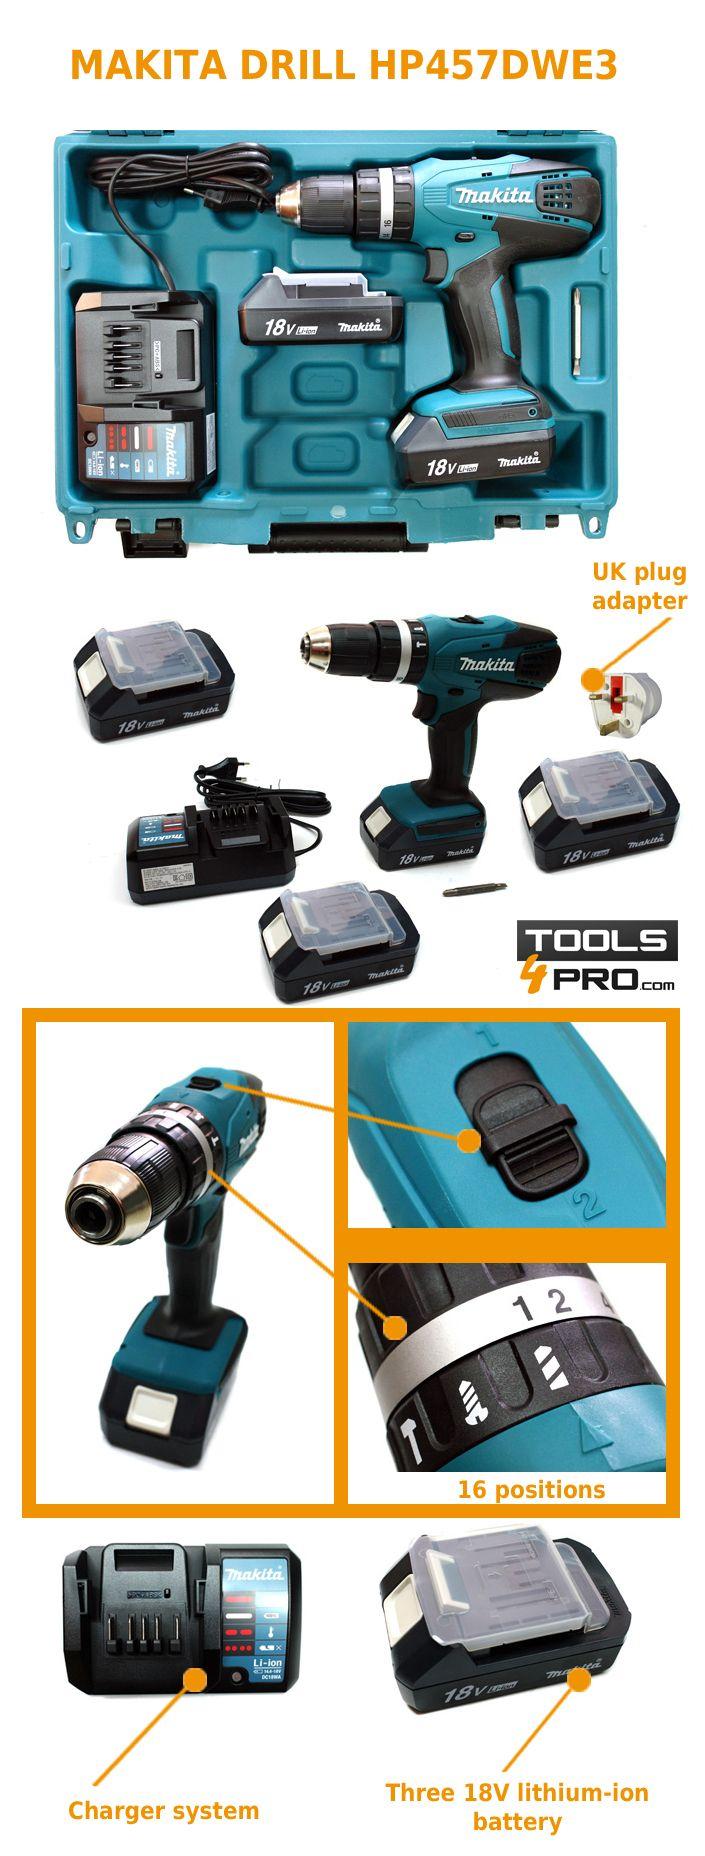 Makita combined drill 18V HP457DWE3 + FREE Makita 34pc Drill Bits Set D-36980 - Tools4Pro